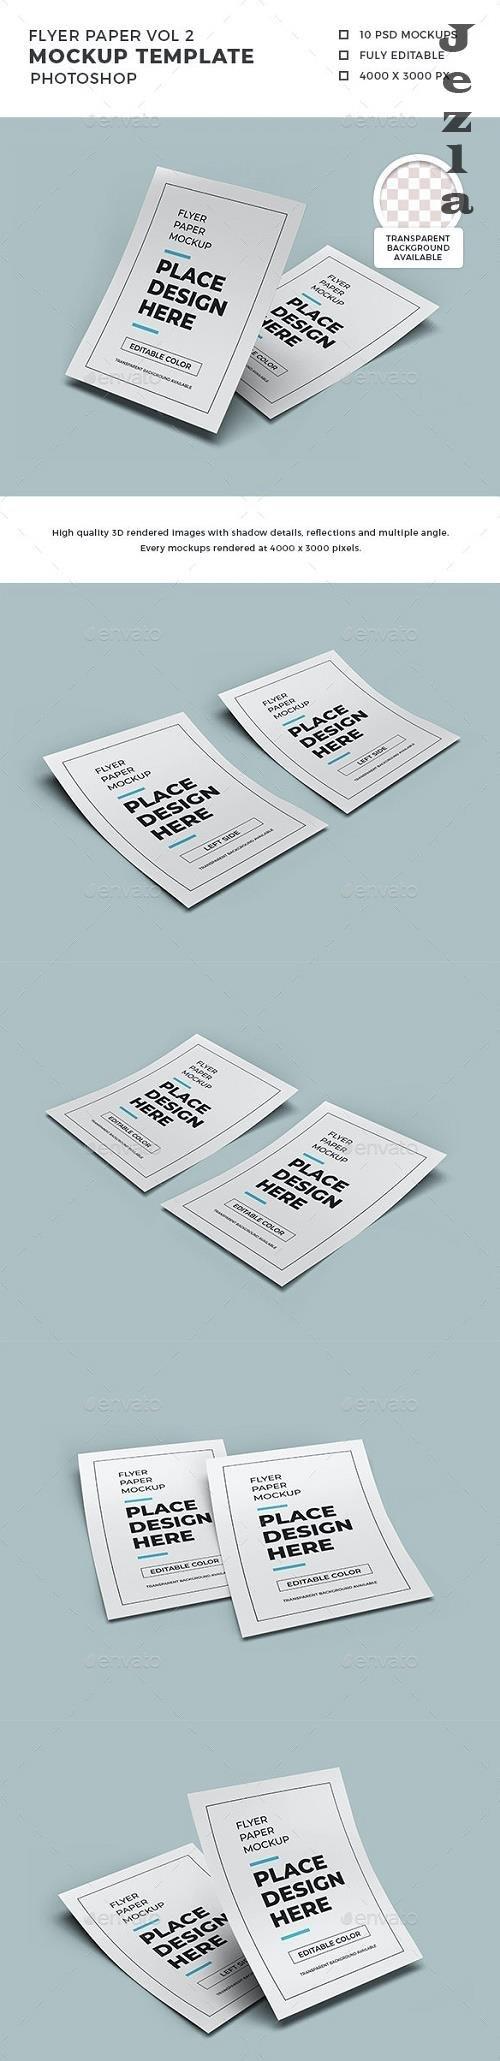 Flyer Paper Mockup Template Set Vol 2 - 32507113